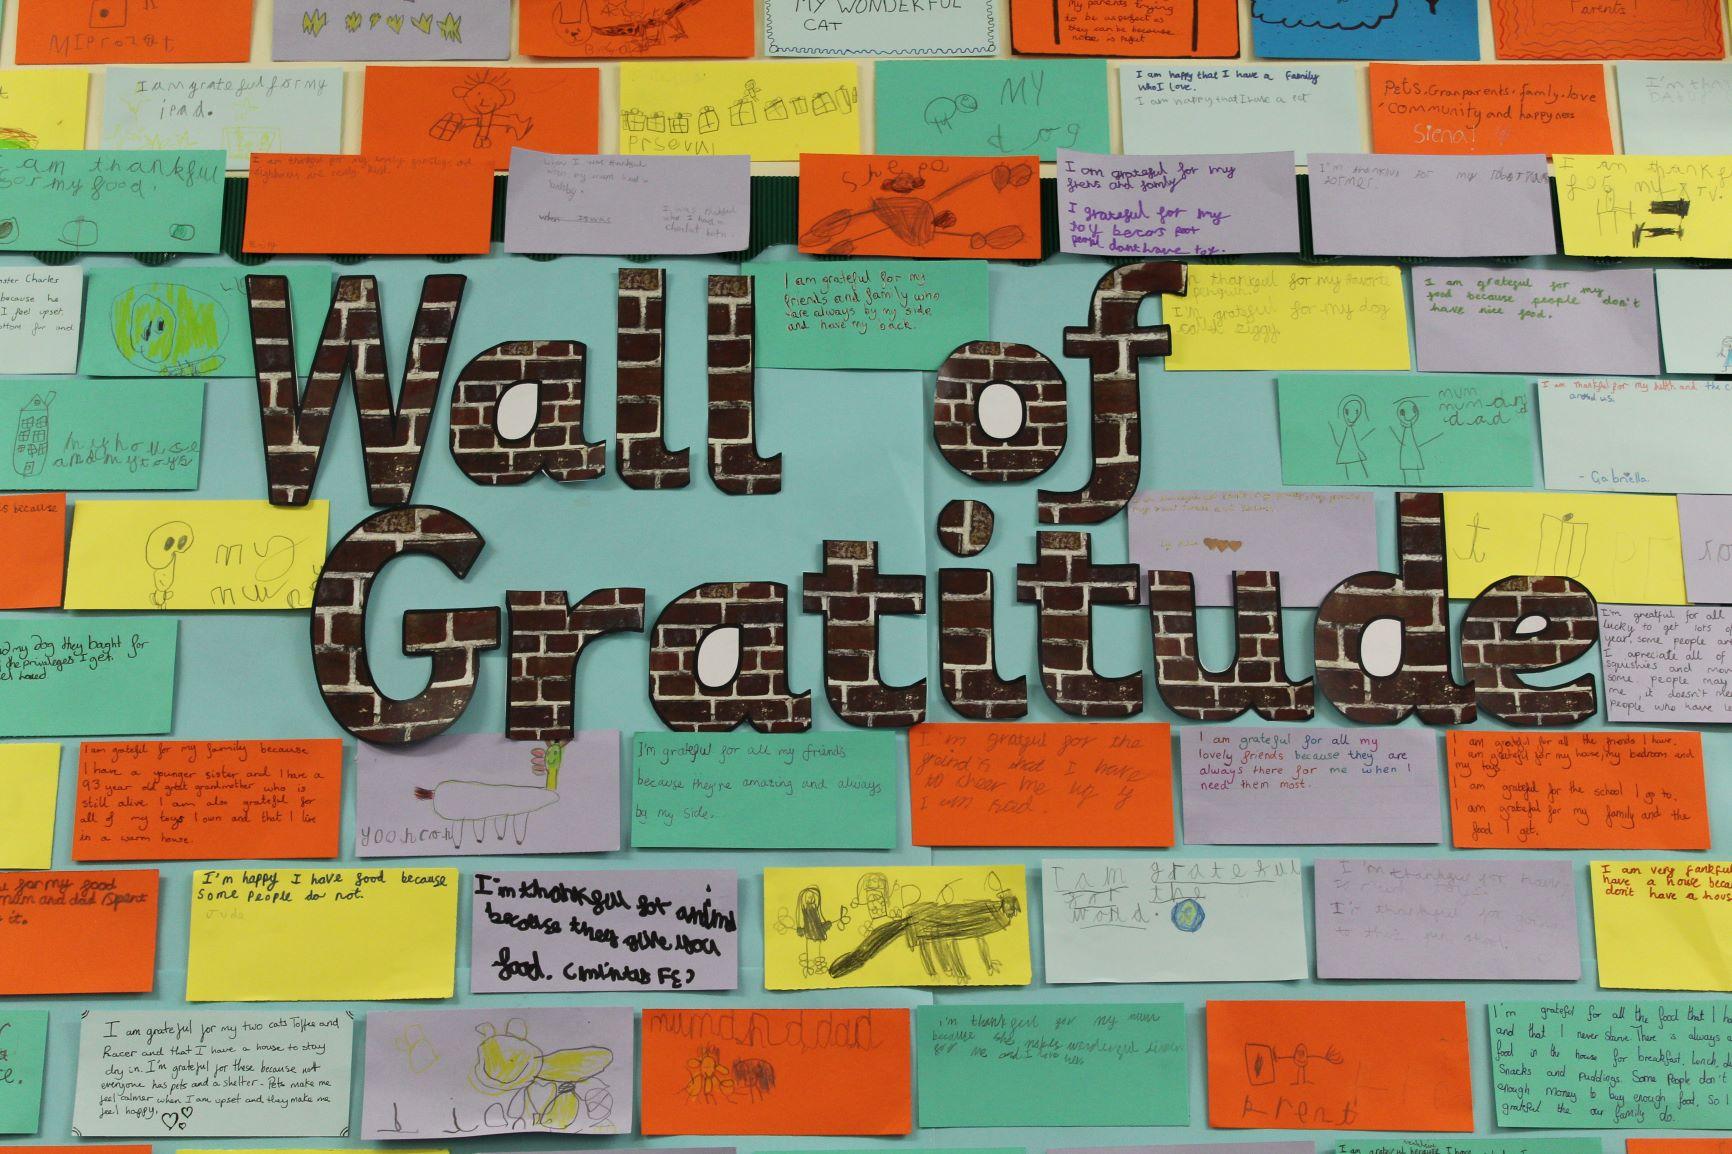 The CBPPS Gratitude Wall